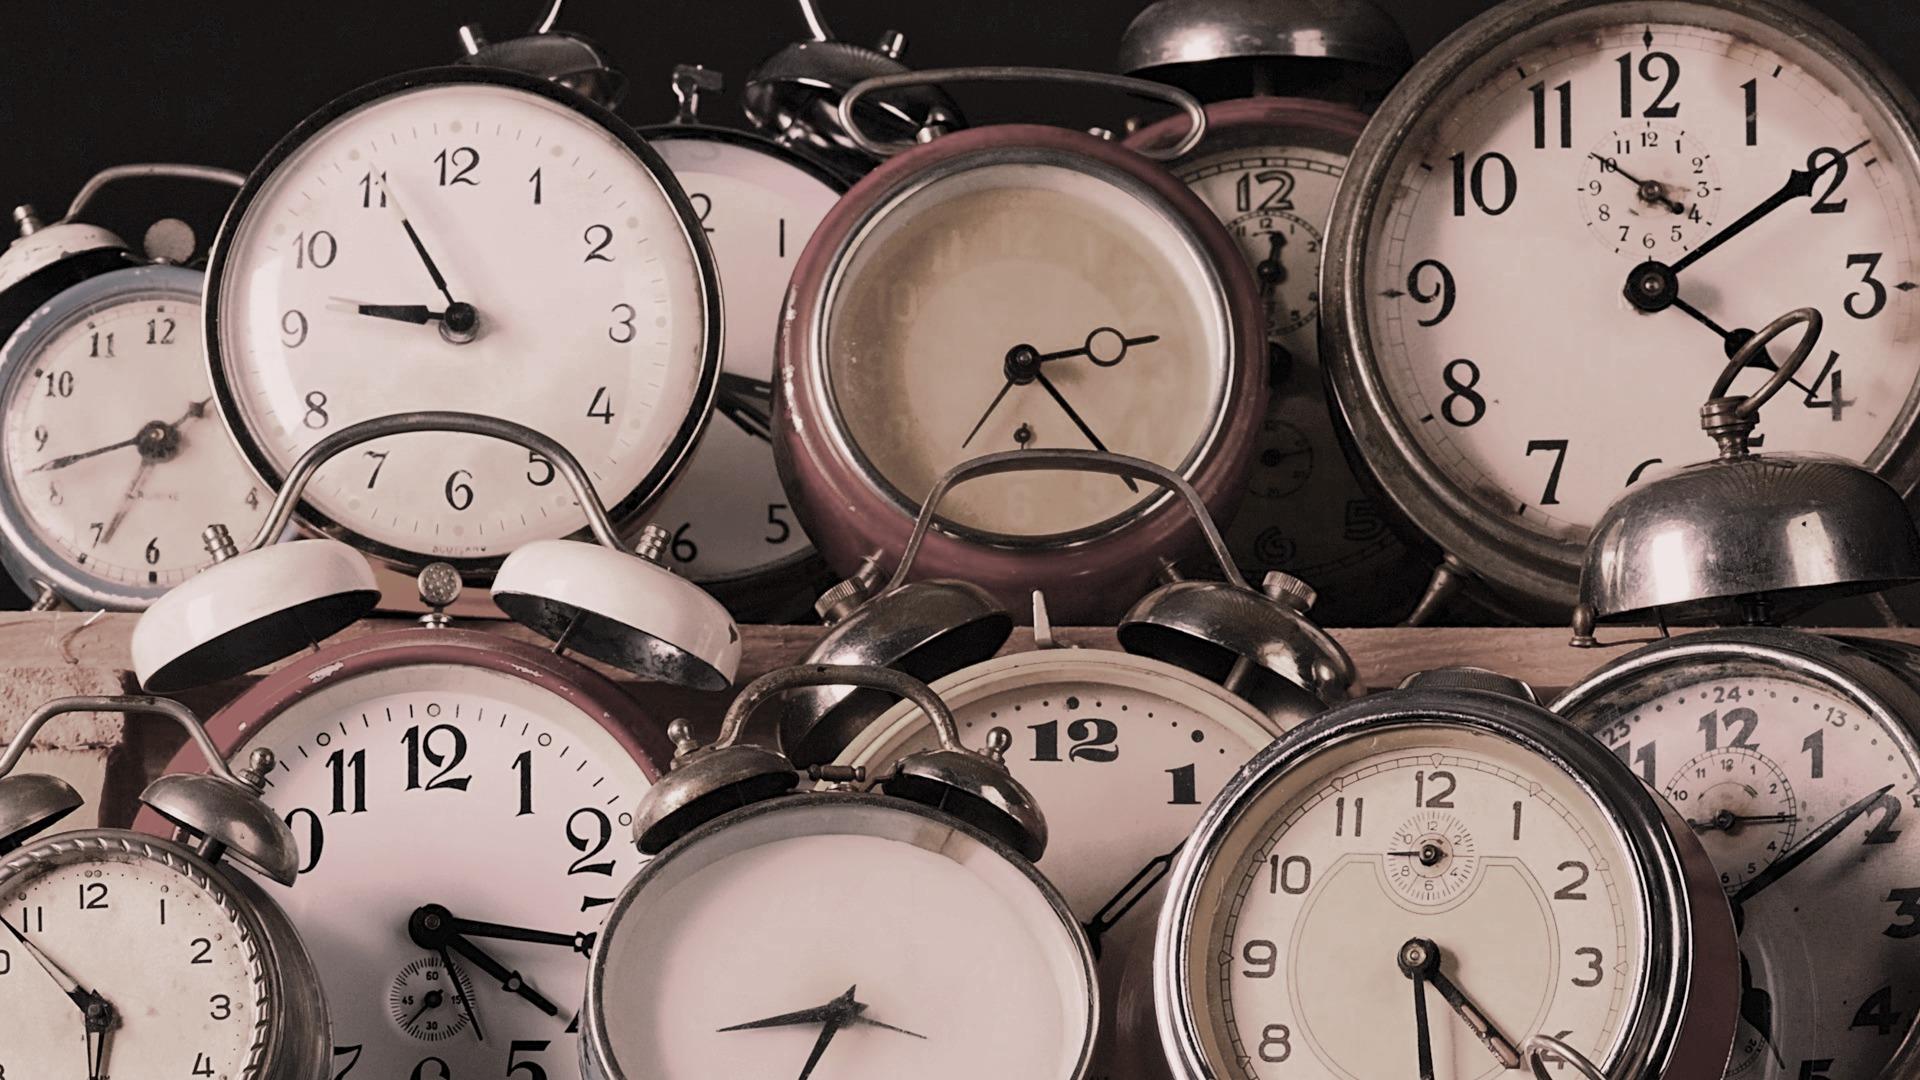 antique-clock-wallpaper-mobile-whj